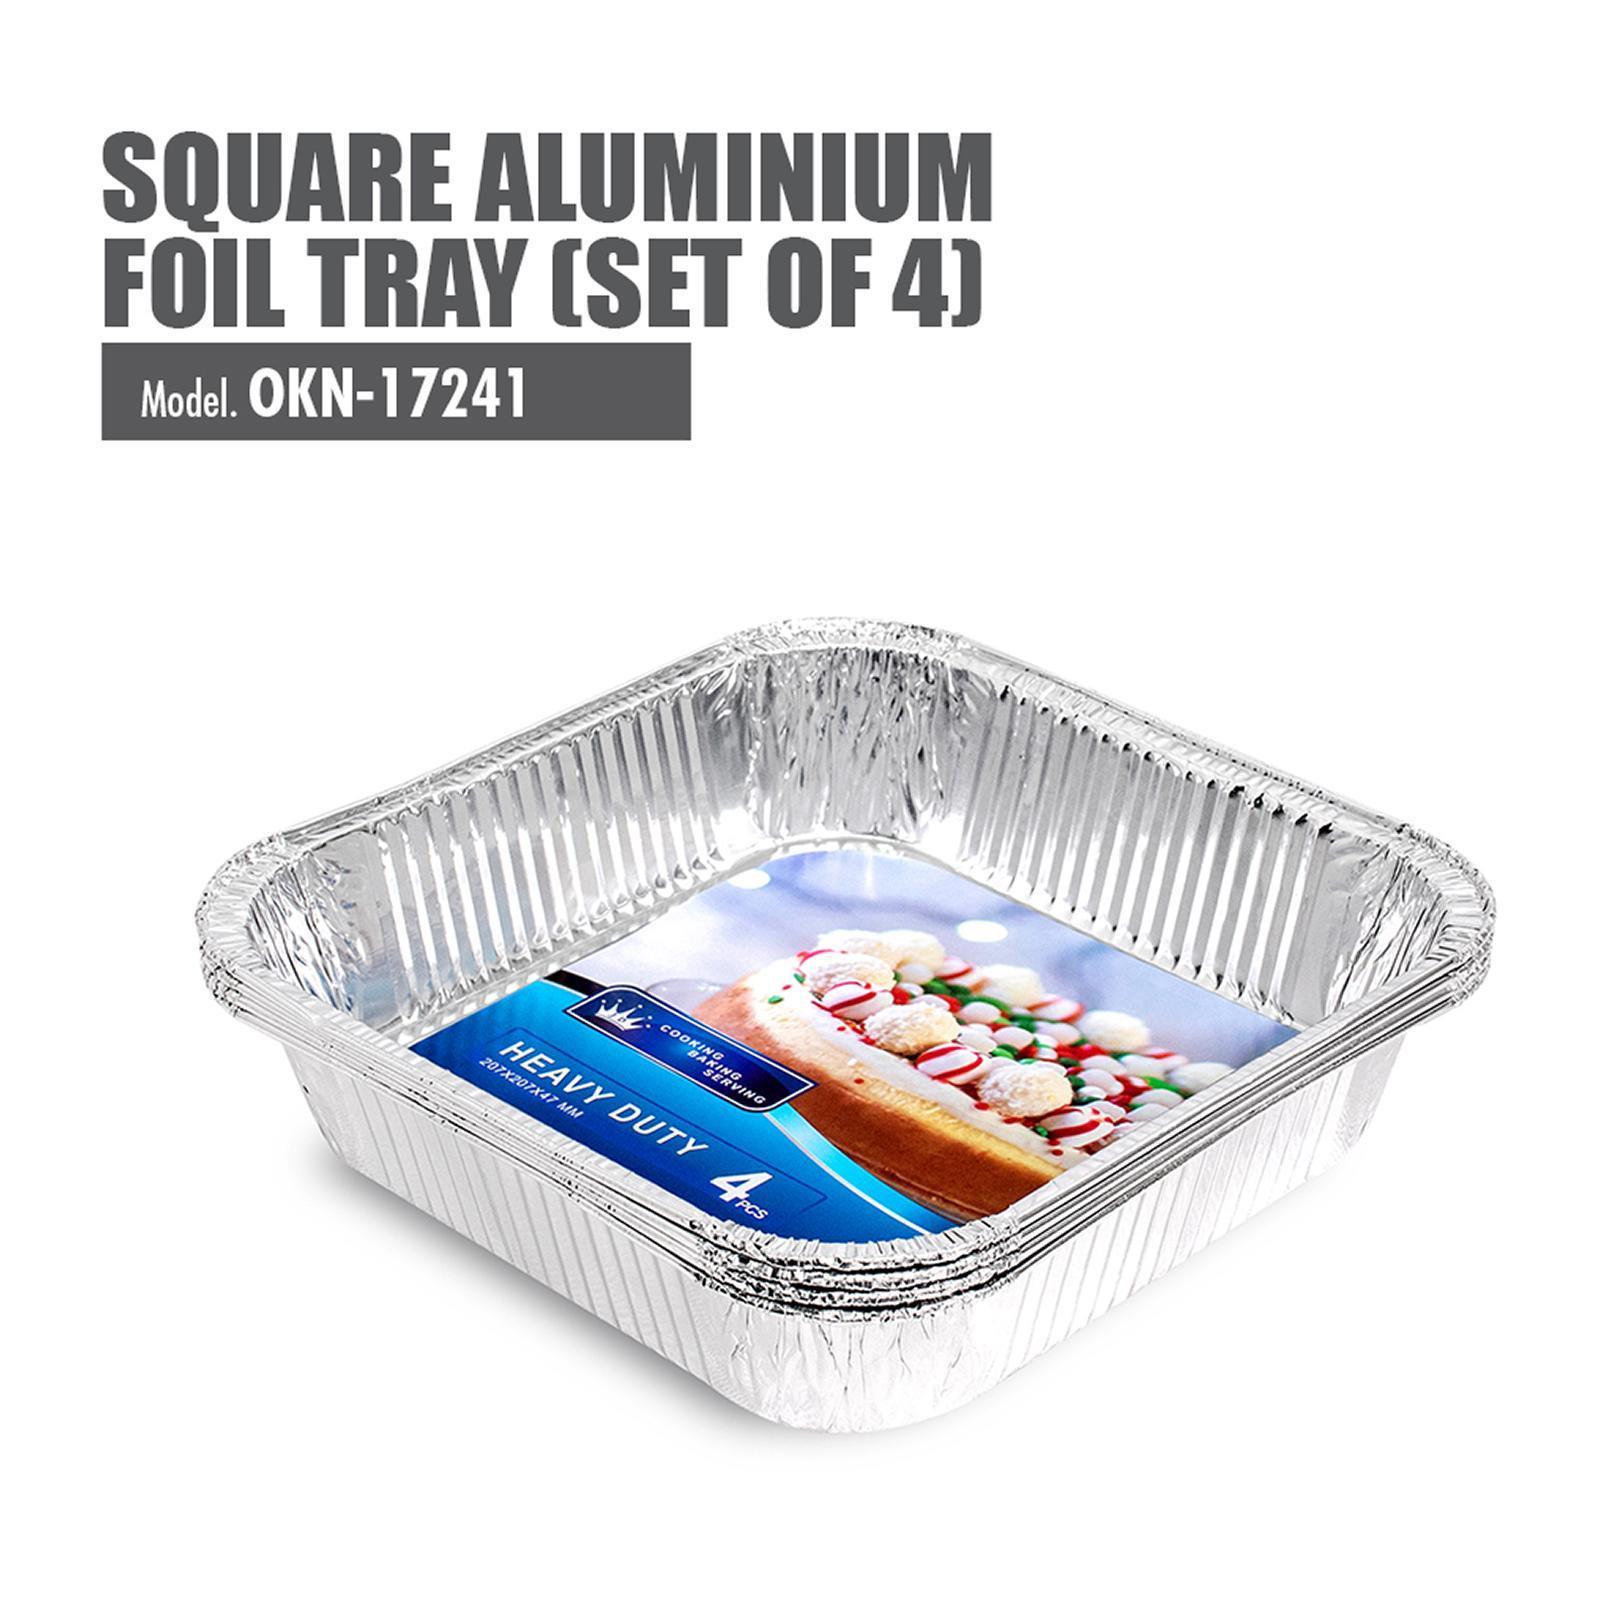 HOUZE Square Aluminium Foil Tray (Set Of 4) - 207X207X47MM